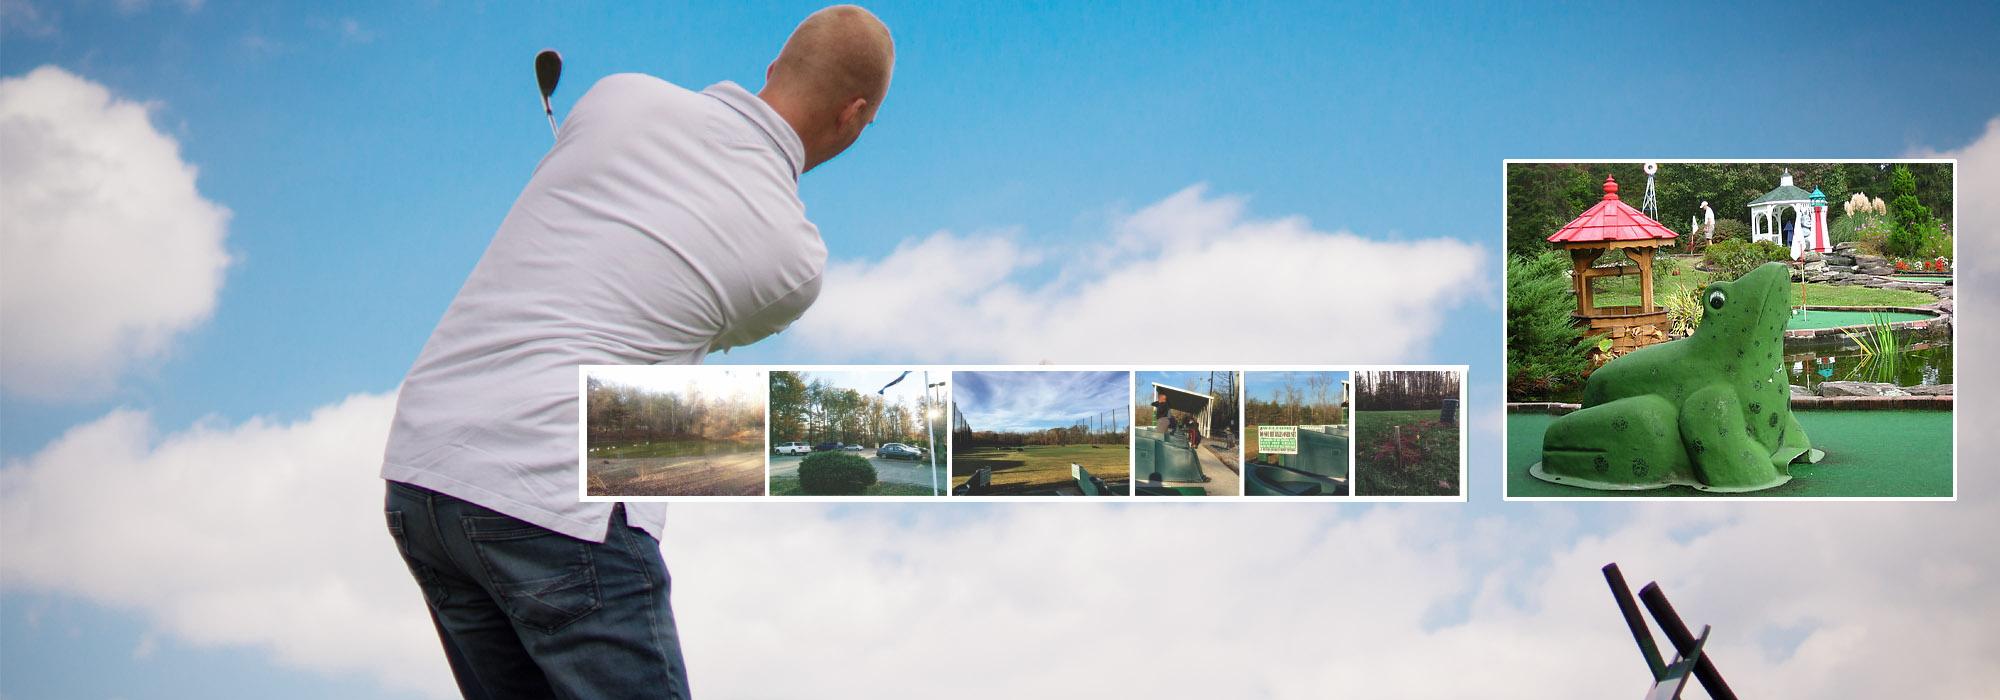 Miniature Golf Course, Drive Range for Sale